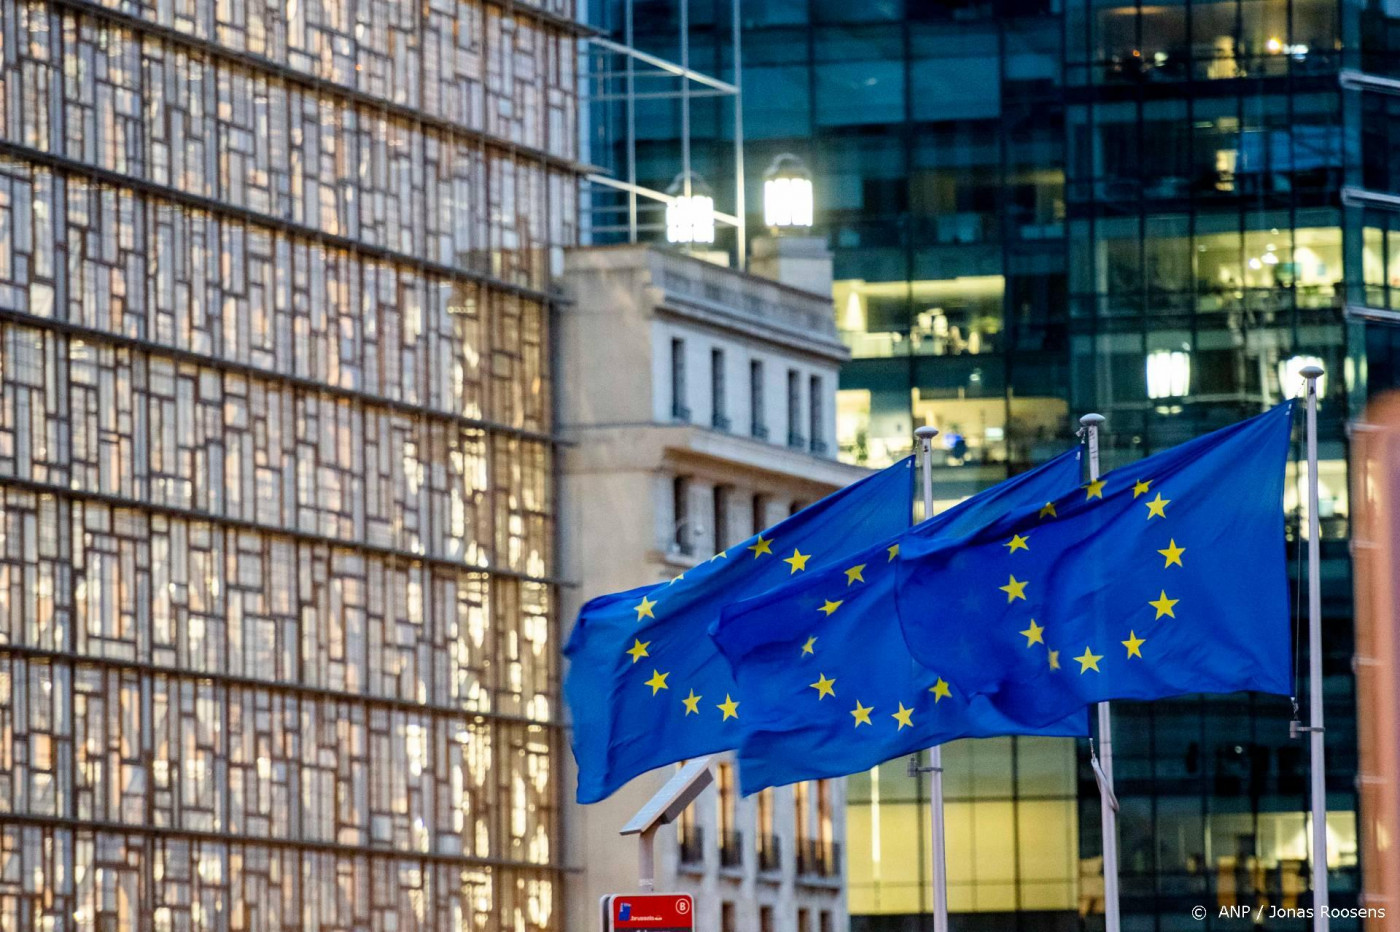 Europa wil vele miljoenen in innovatieve startups steken